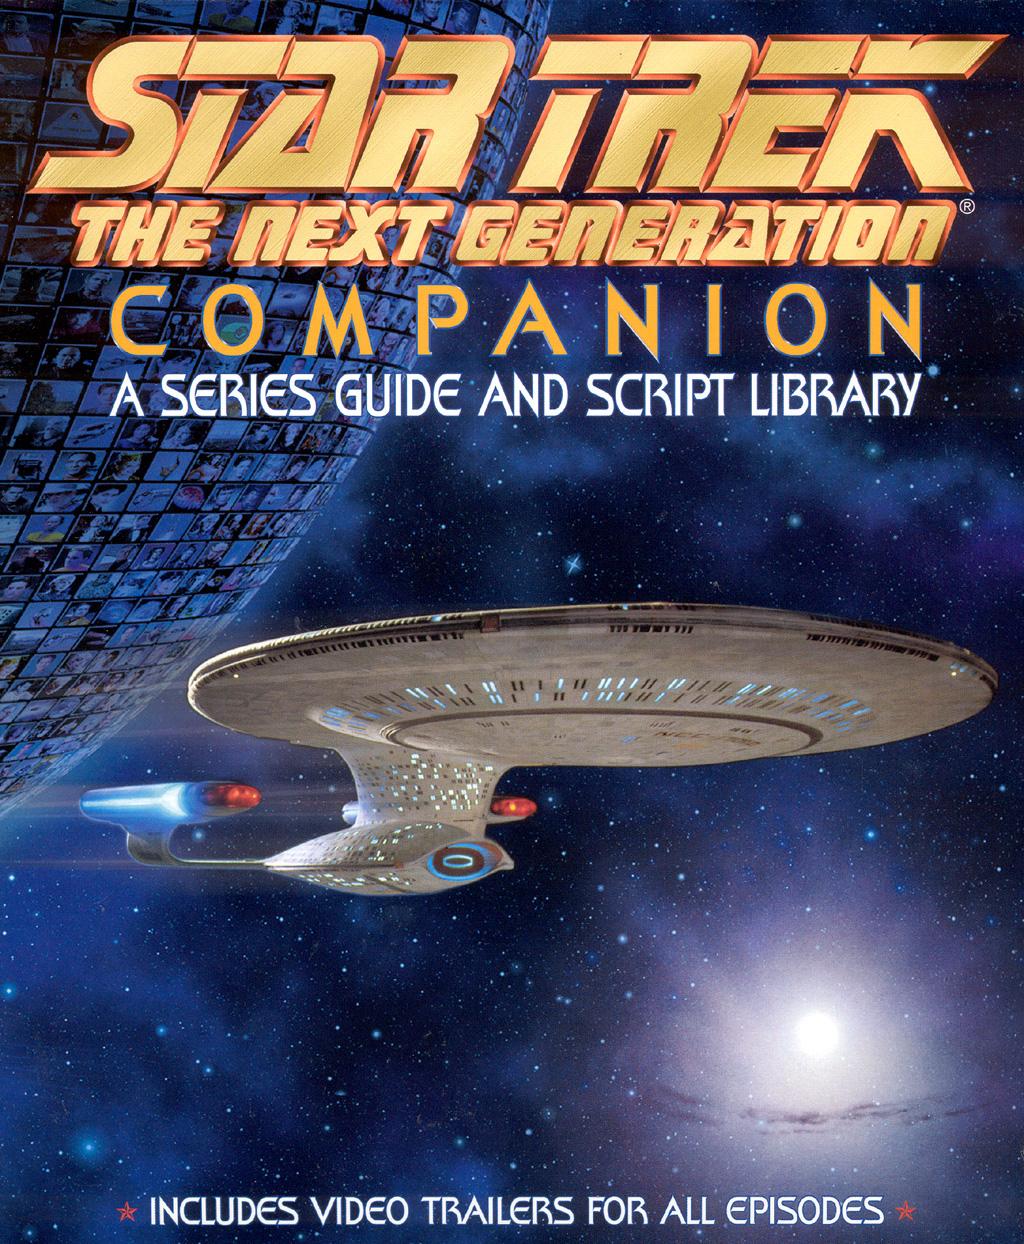 Star Trek The Next Generation Companion cover.jpg